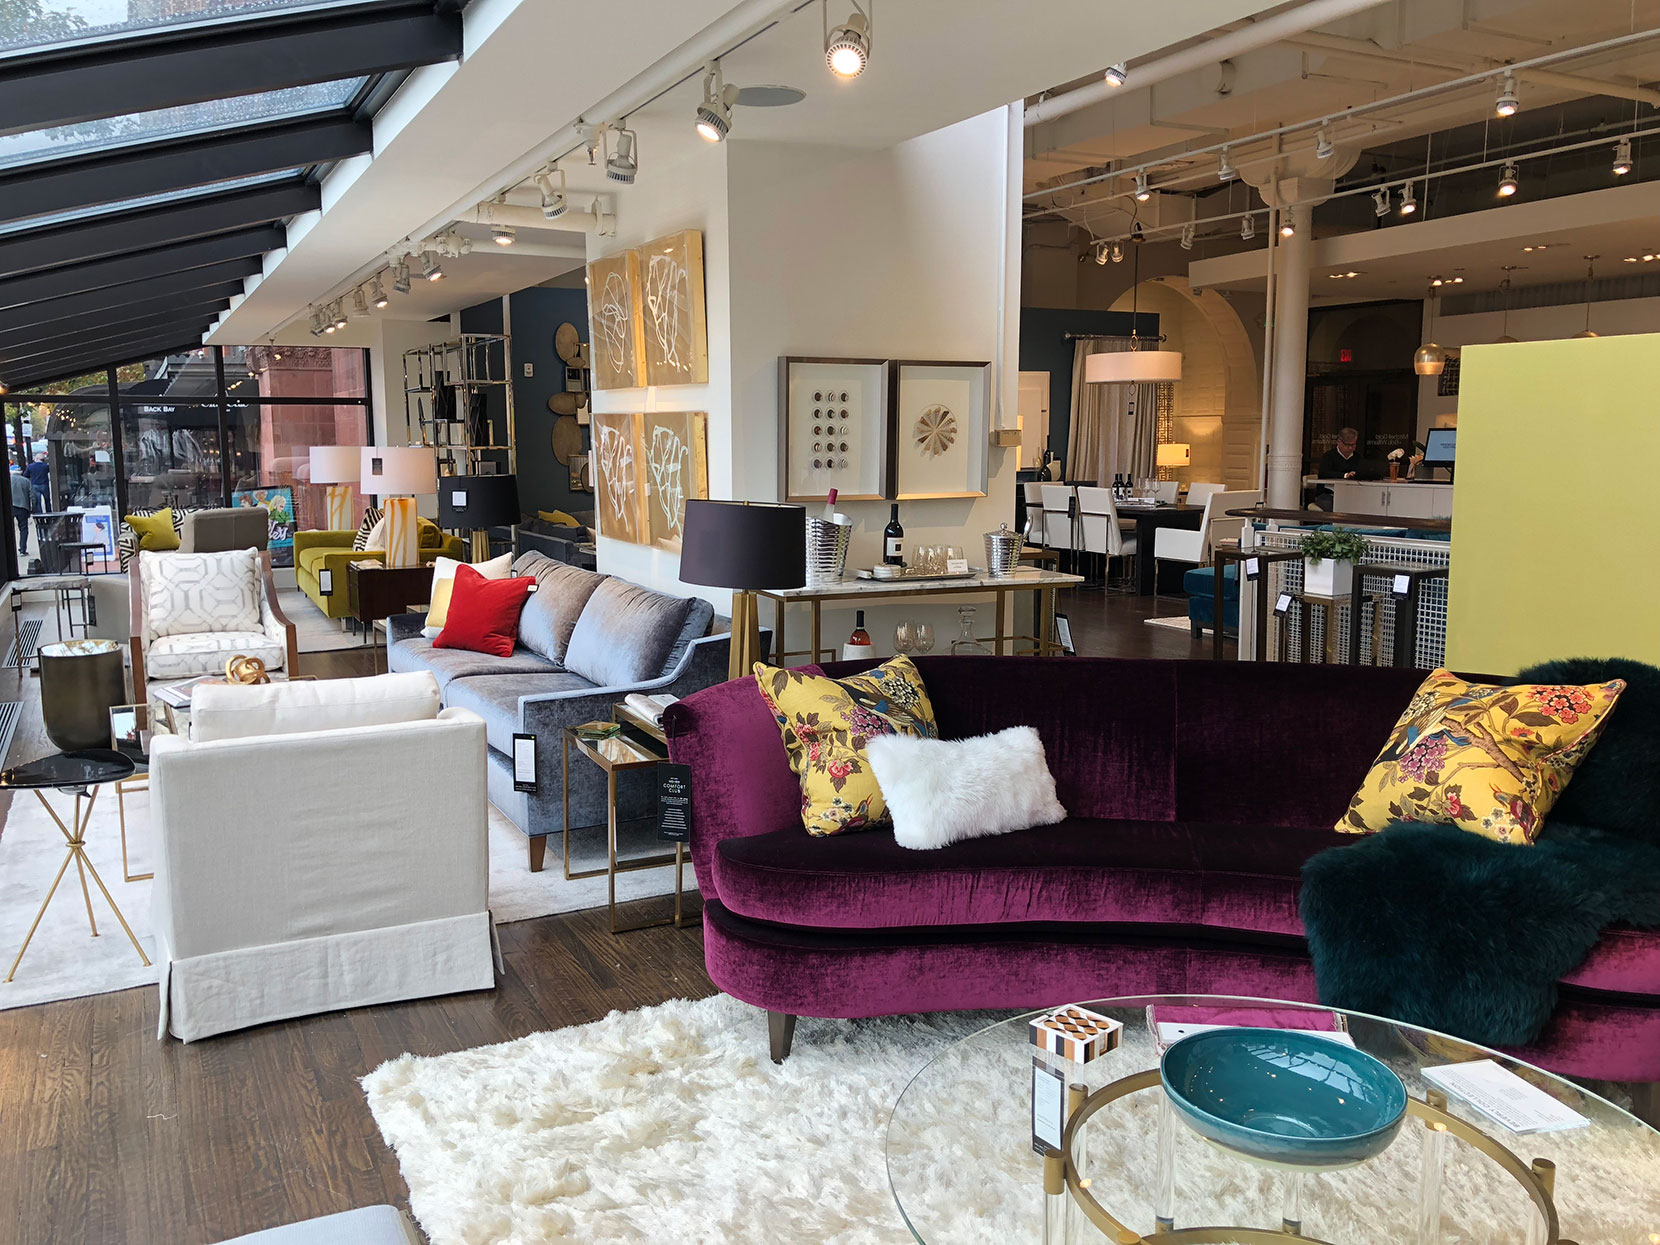 Mitchell Gold + Bob Williams In-Store Floor Sample Sale through Feb. 10